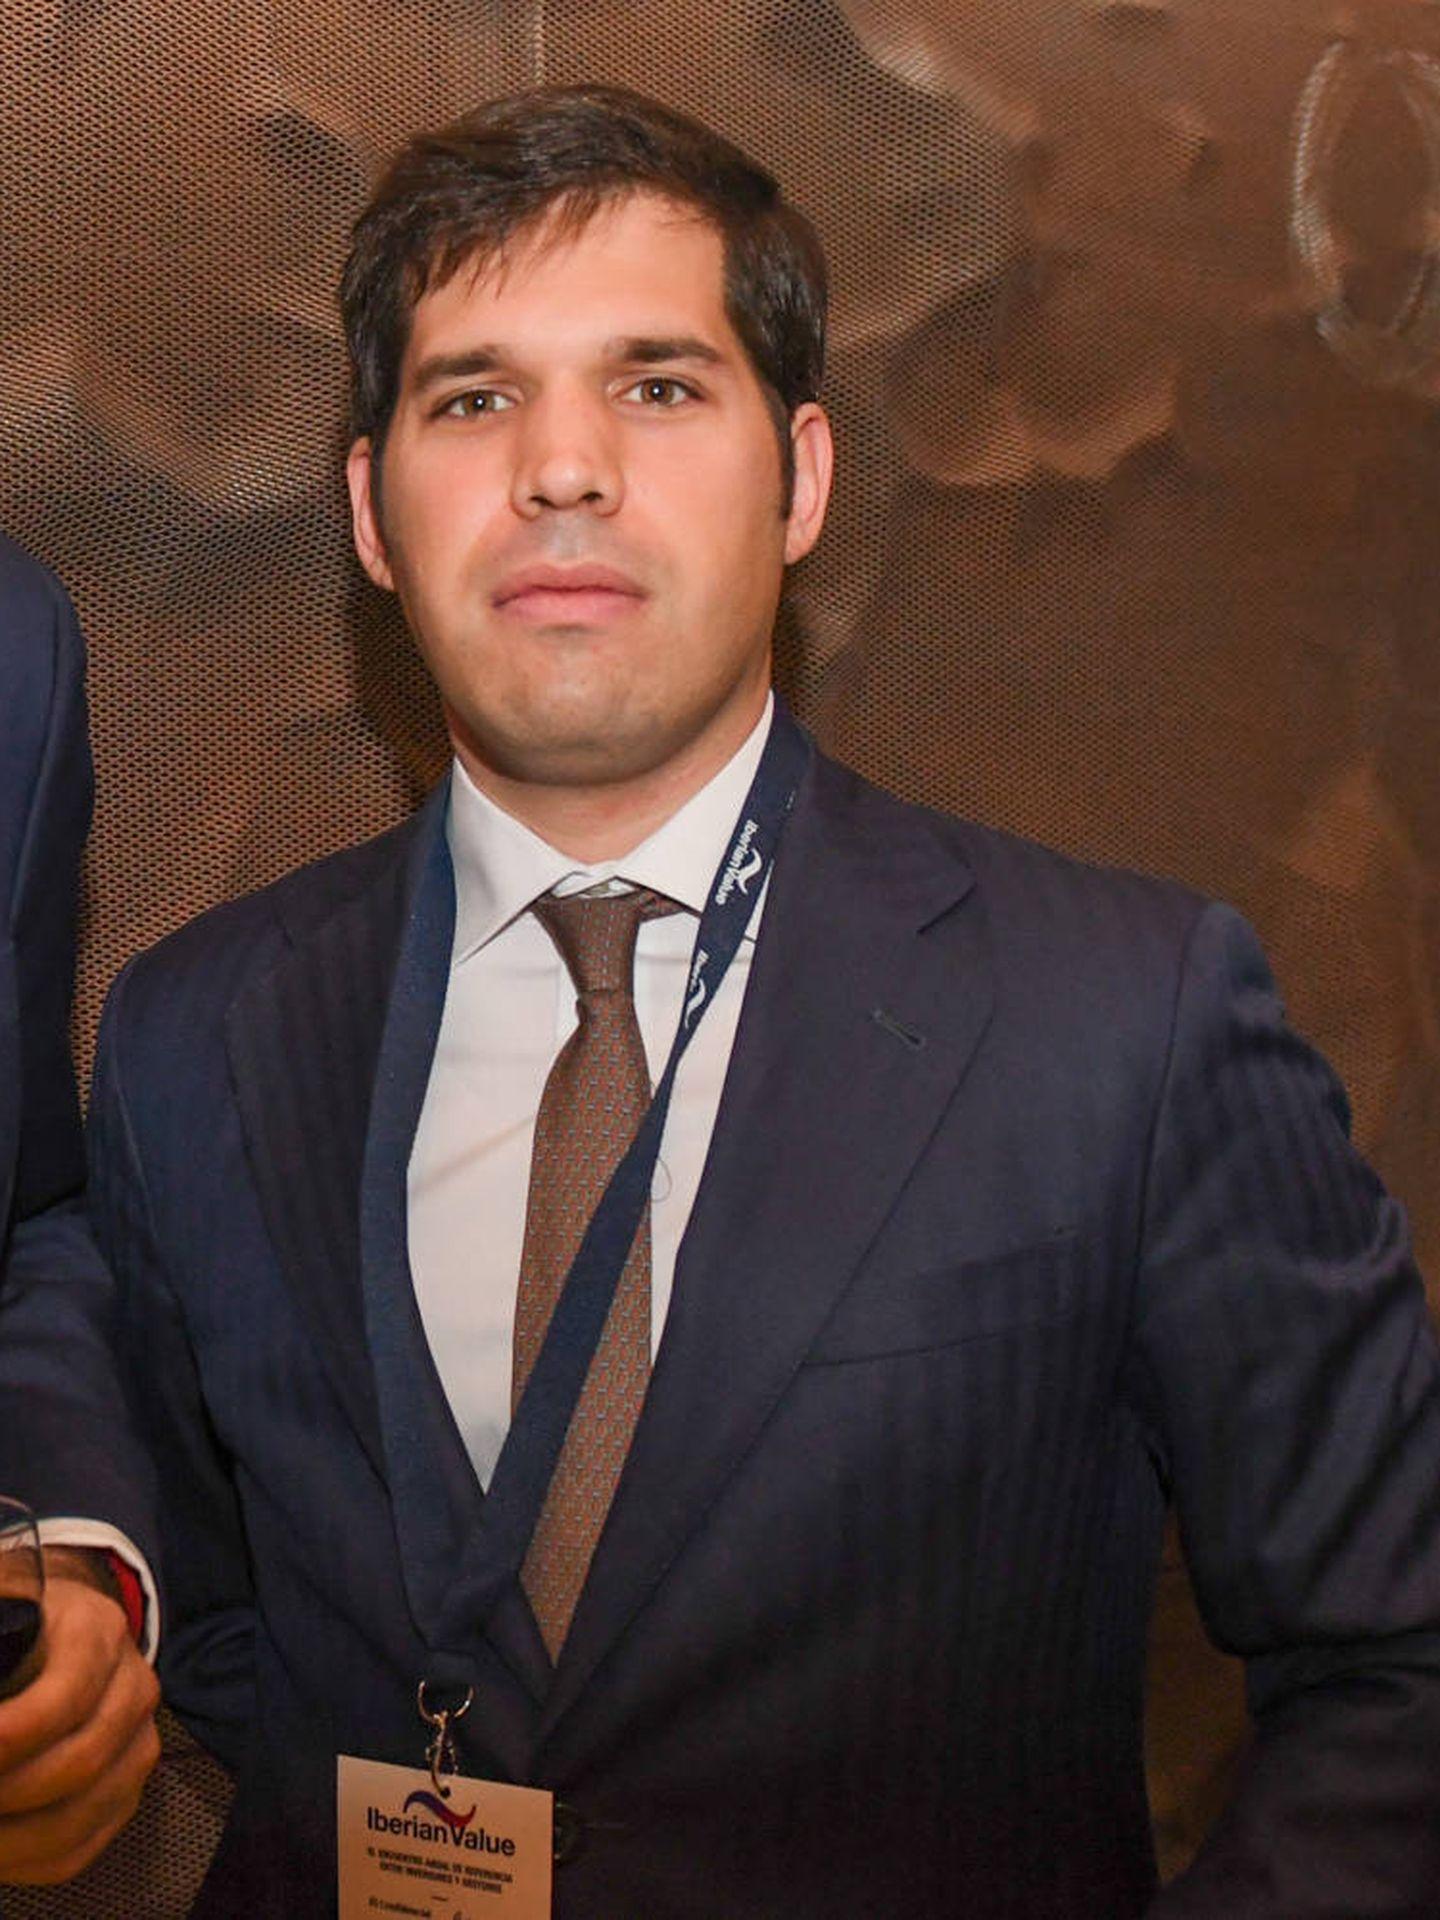 Beltrán Palazuelo, Santalucía AM en el Iberian Value.